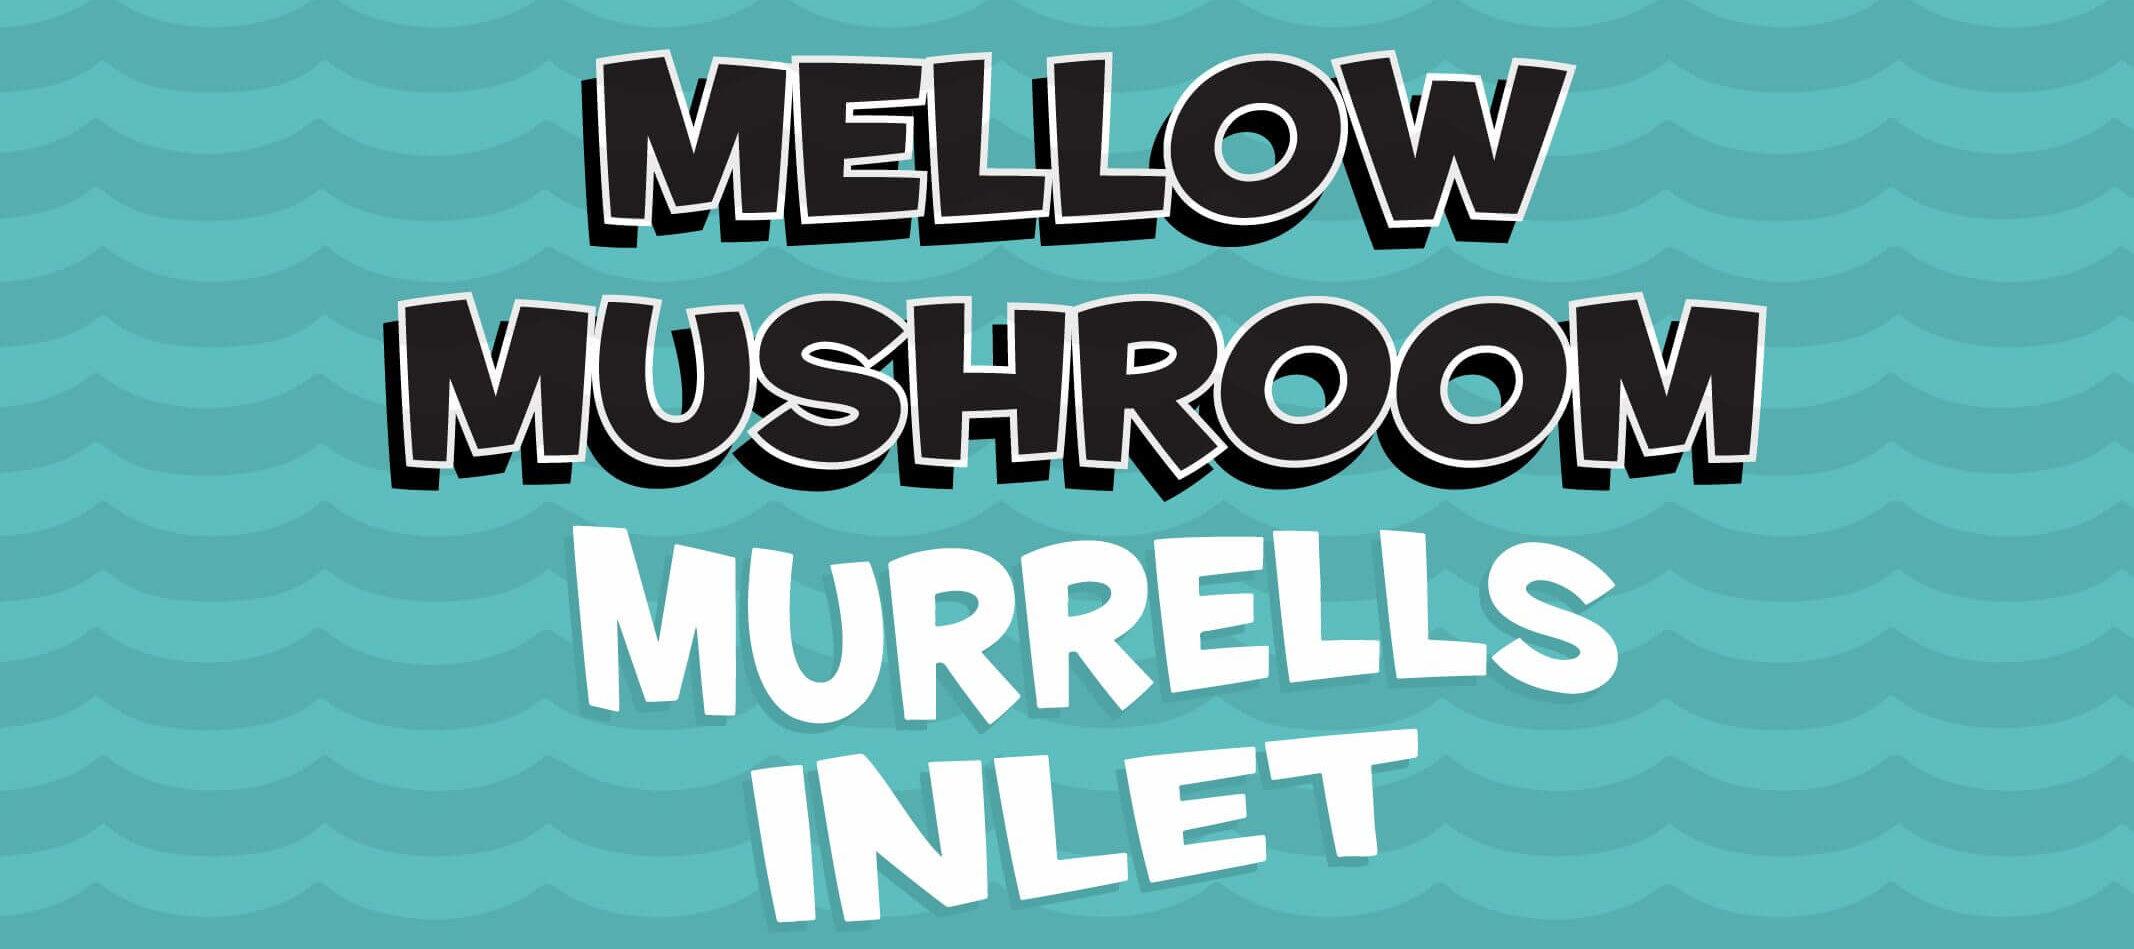 store information Mellow Mushroom Murrells Inlet local design logo